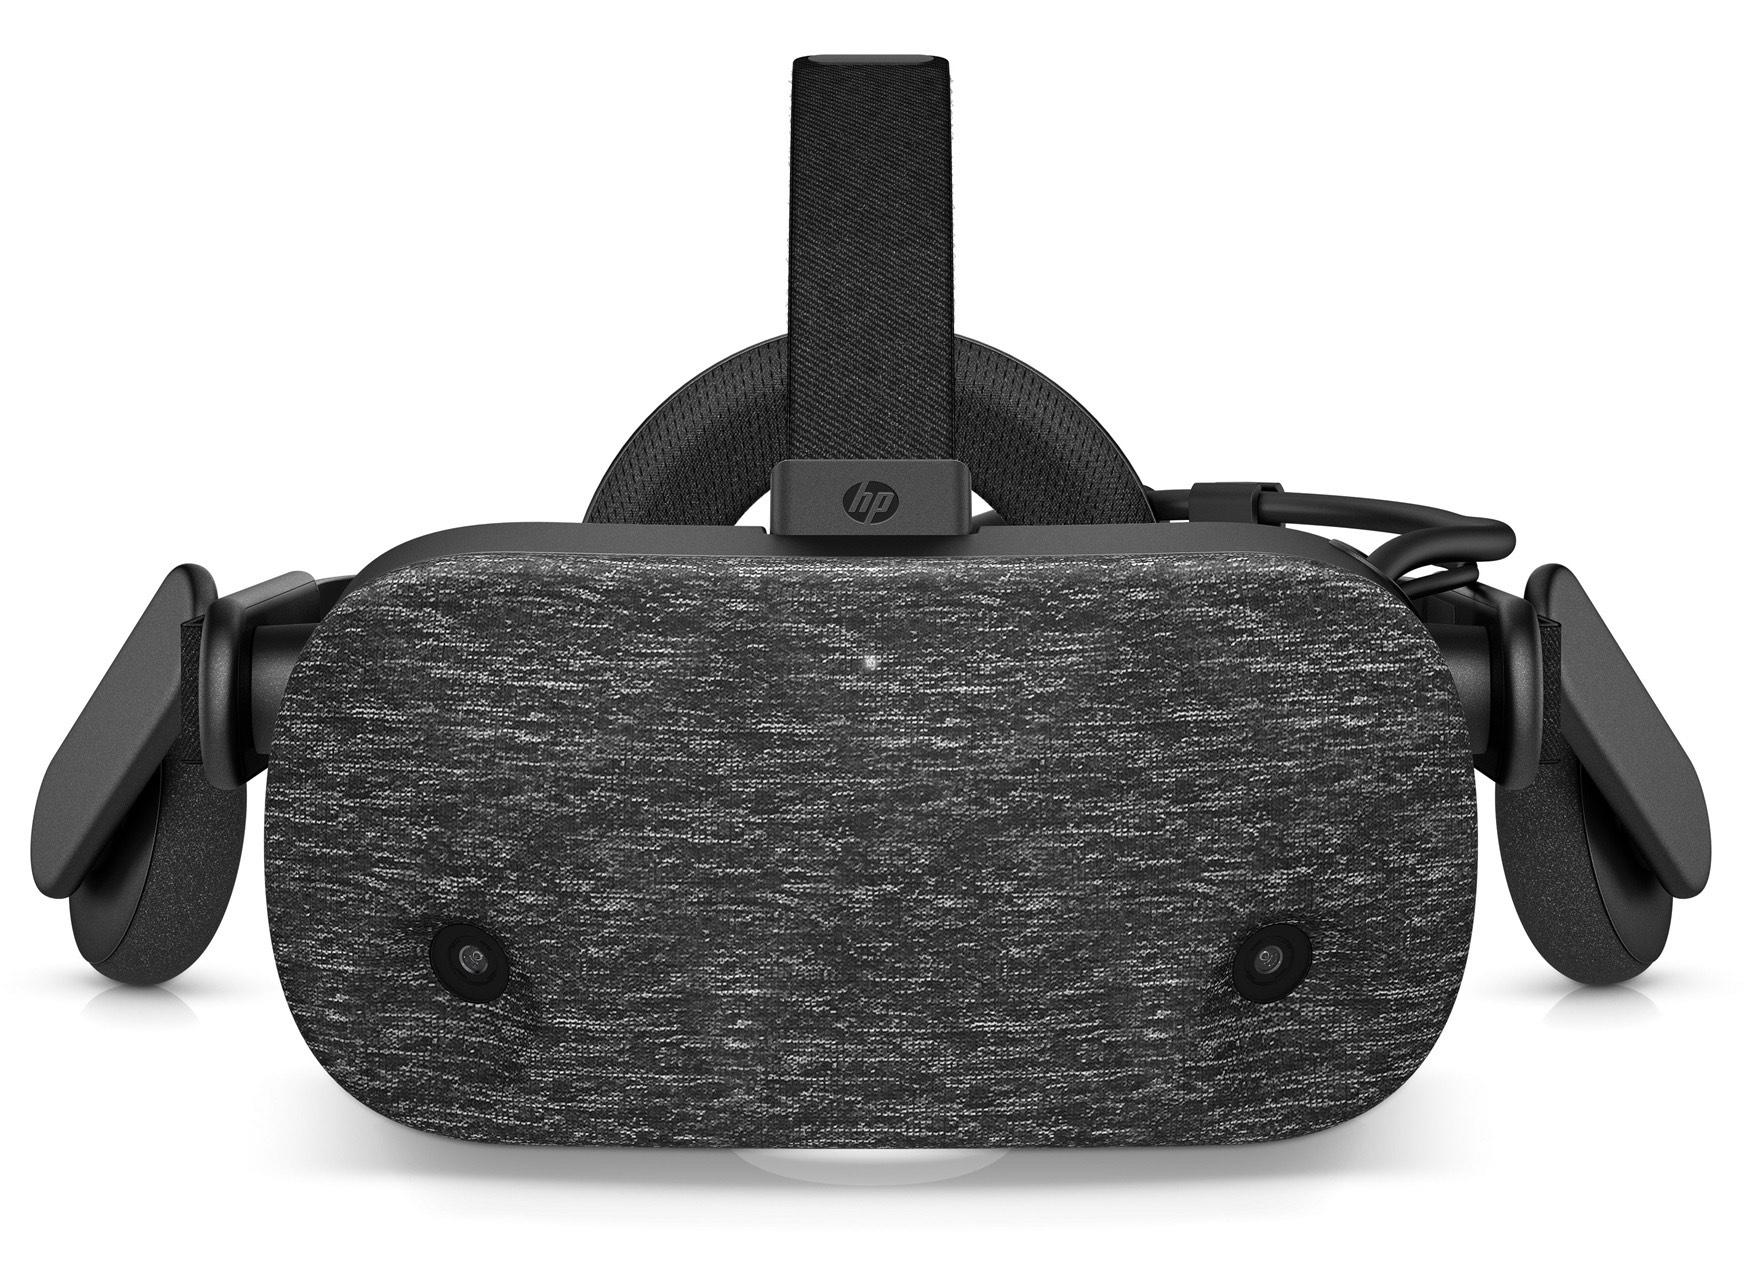 [VR] HP Reverb